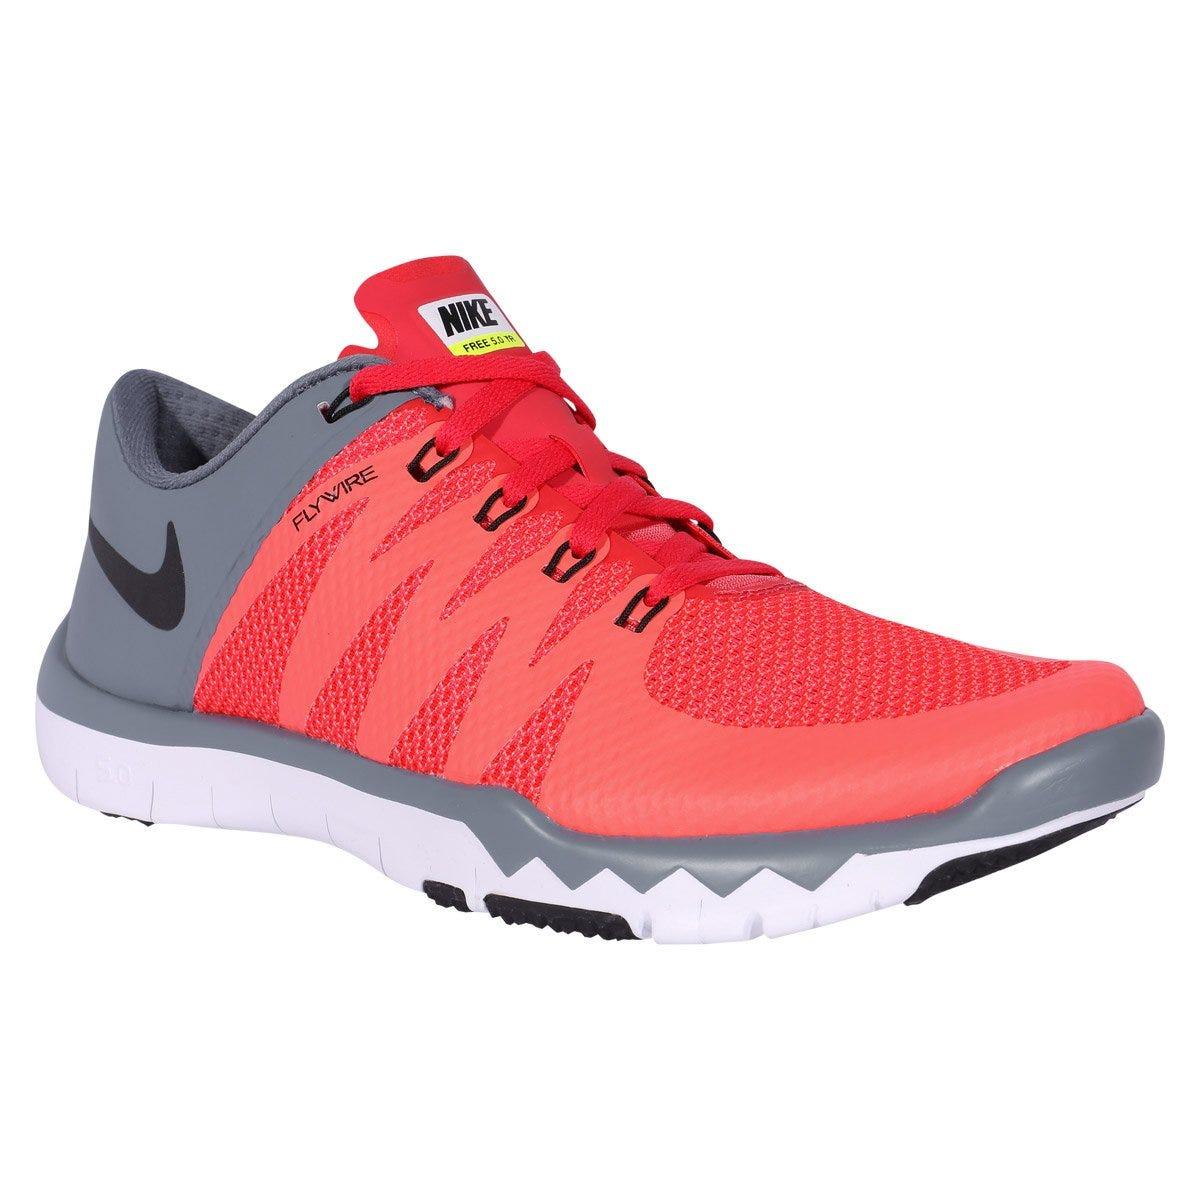 Nike Free Trainer 5.0 V6 Mens Training Shoes - Red/Graphite Black